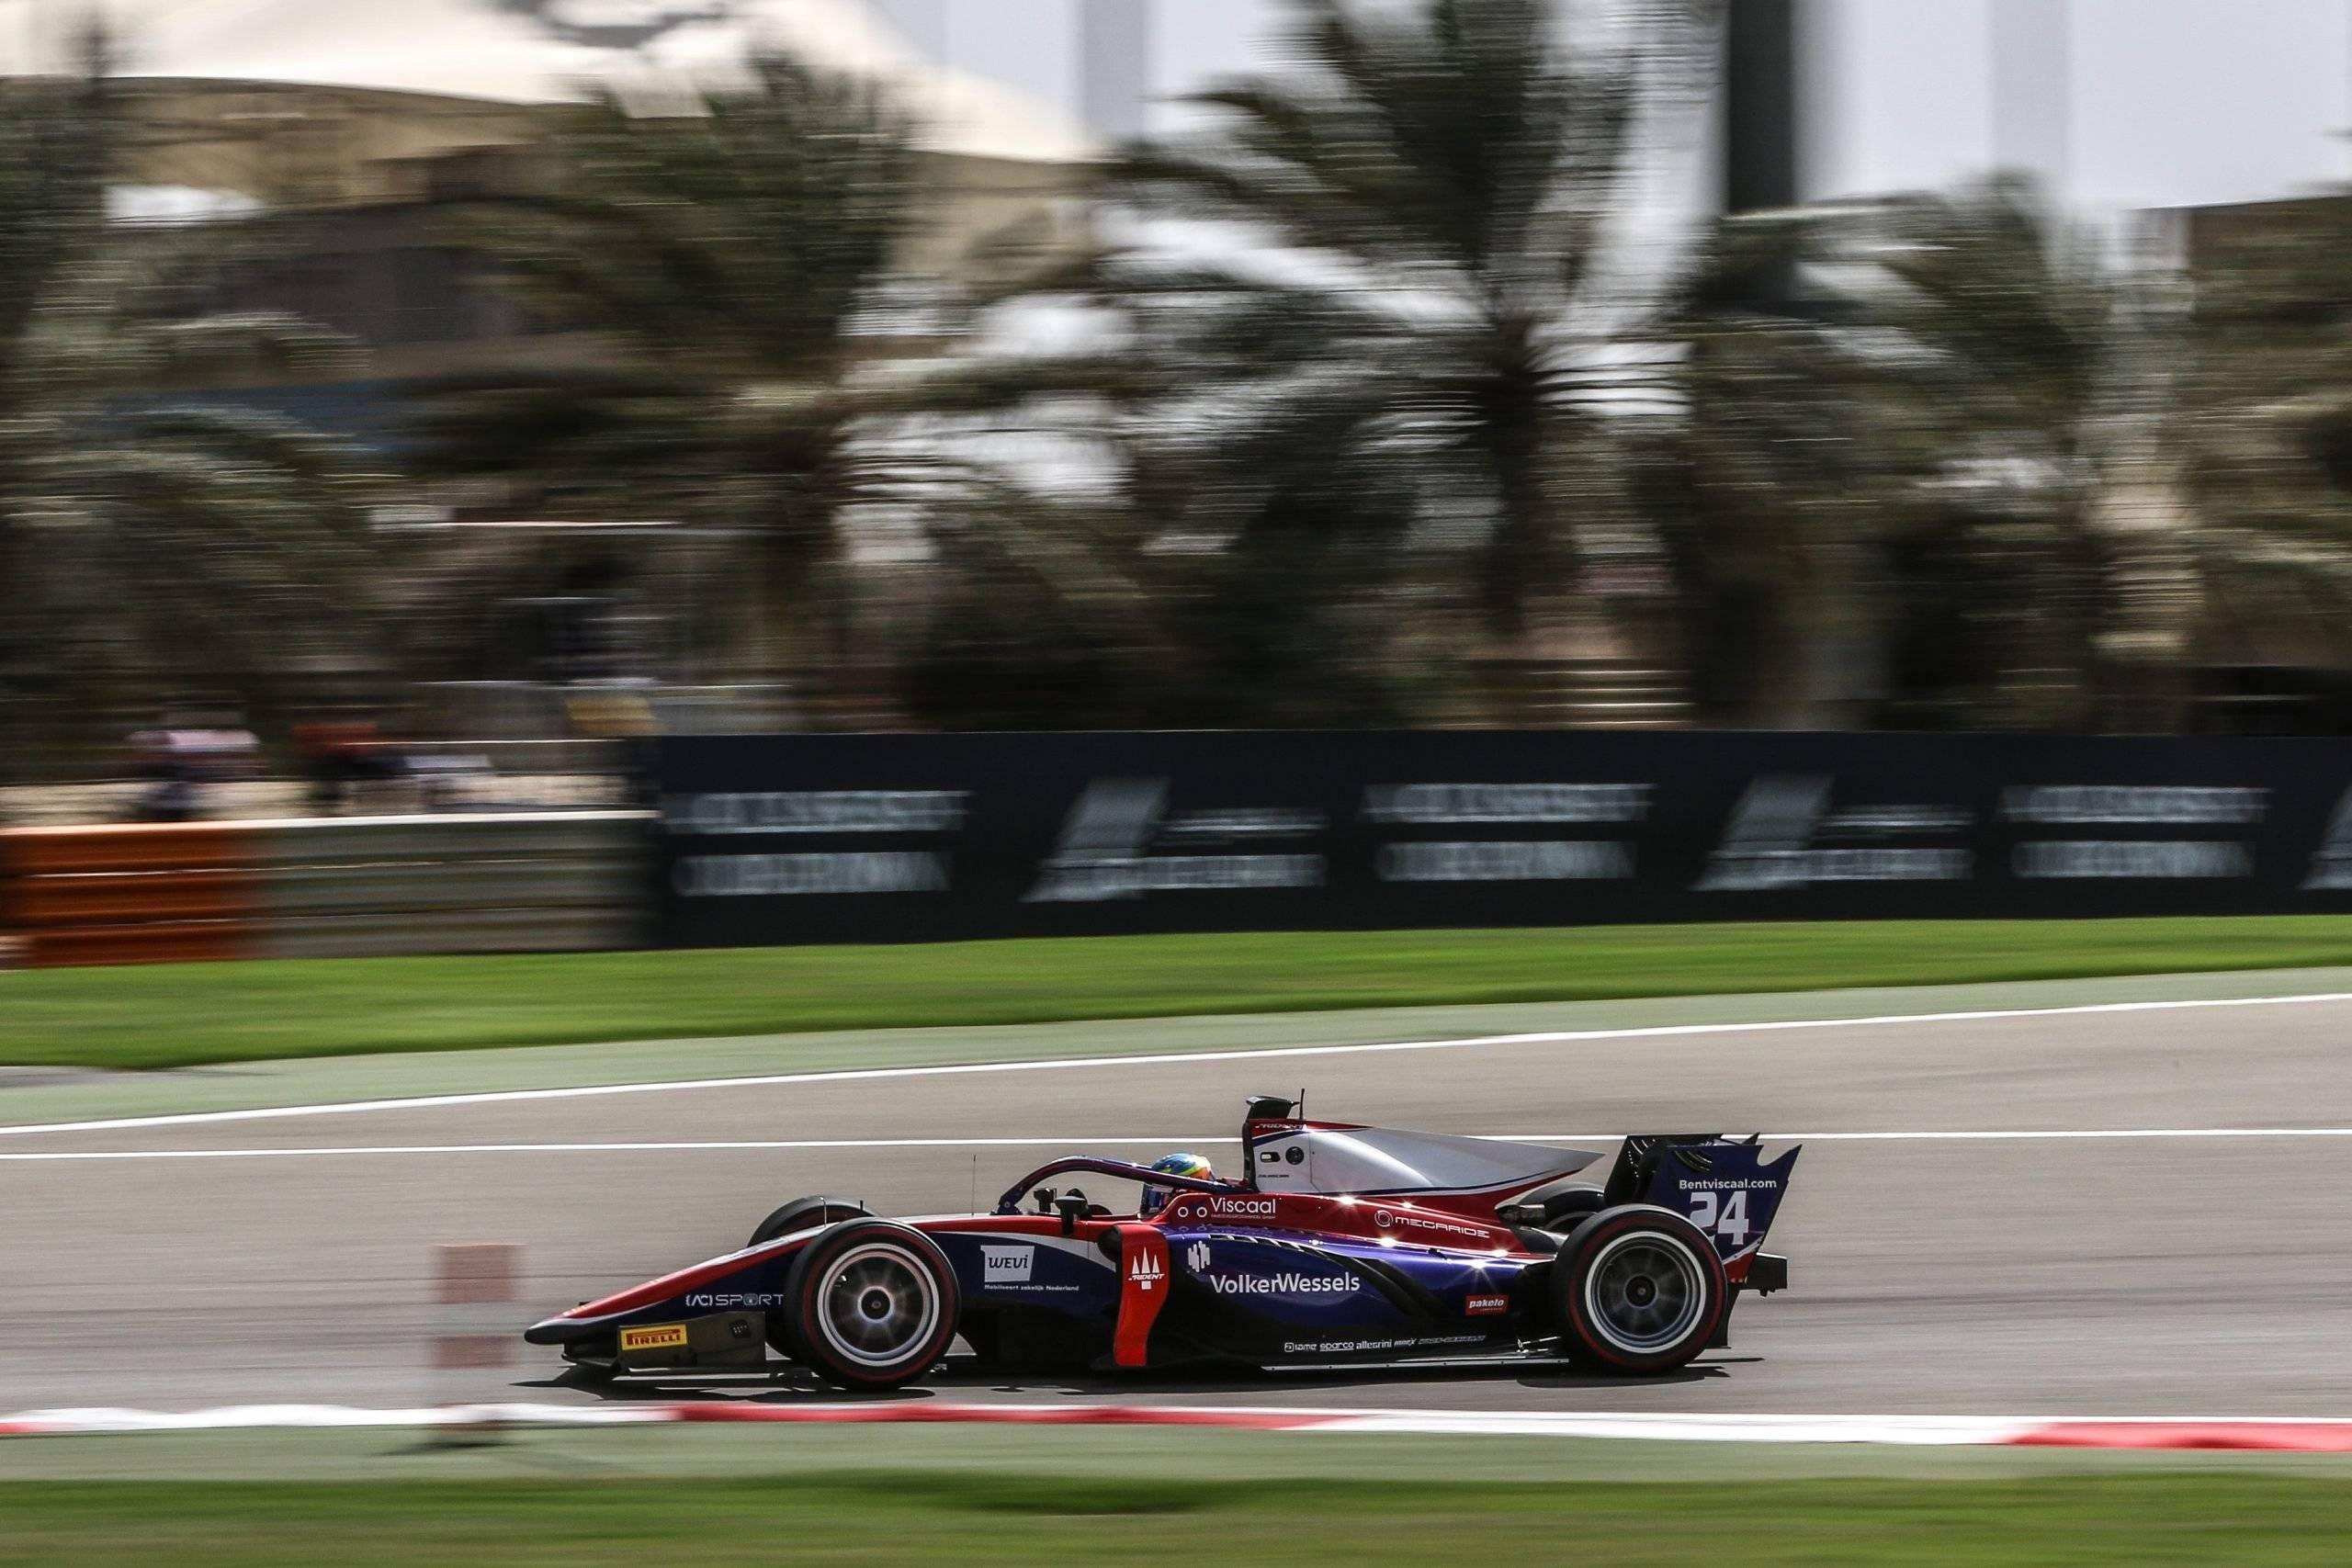 Sakhir (BAH) Mar 26-28, 2021 - First round of the FIA Formula2 Championship at Bahrain International Circuit. Bent Viscaal #24 Trident. © 2021 Diederik van der Laan / Dutch Photo Agency